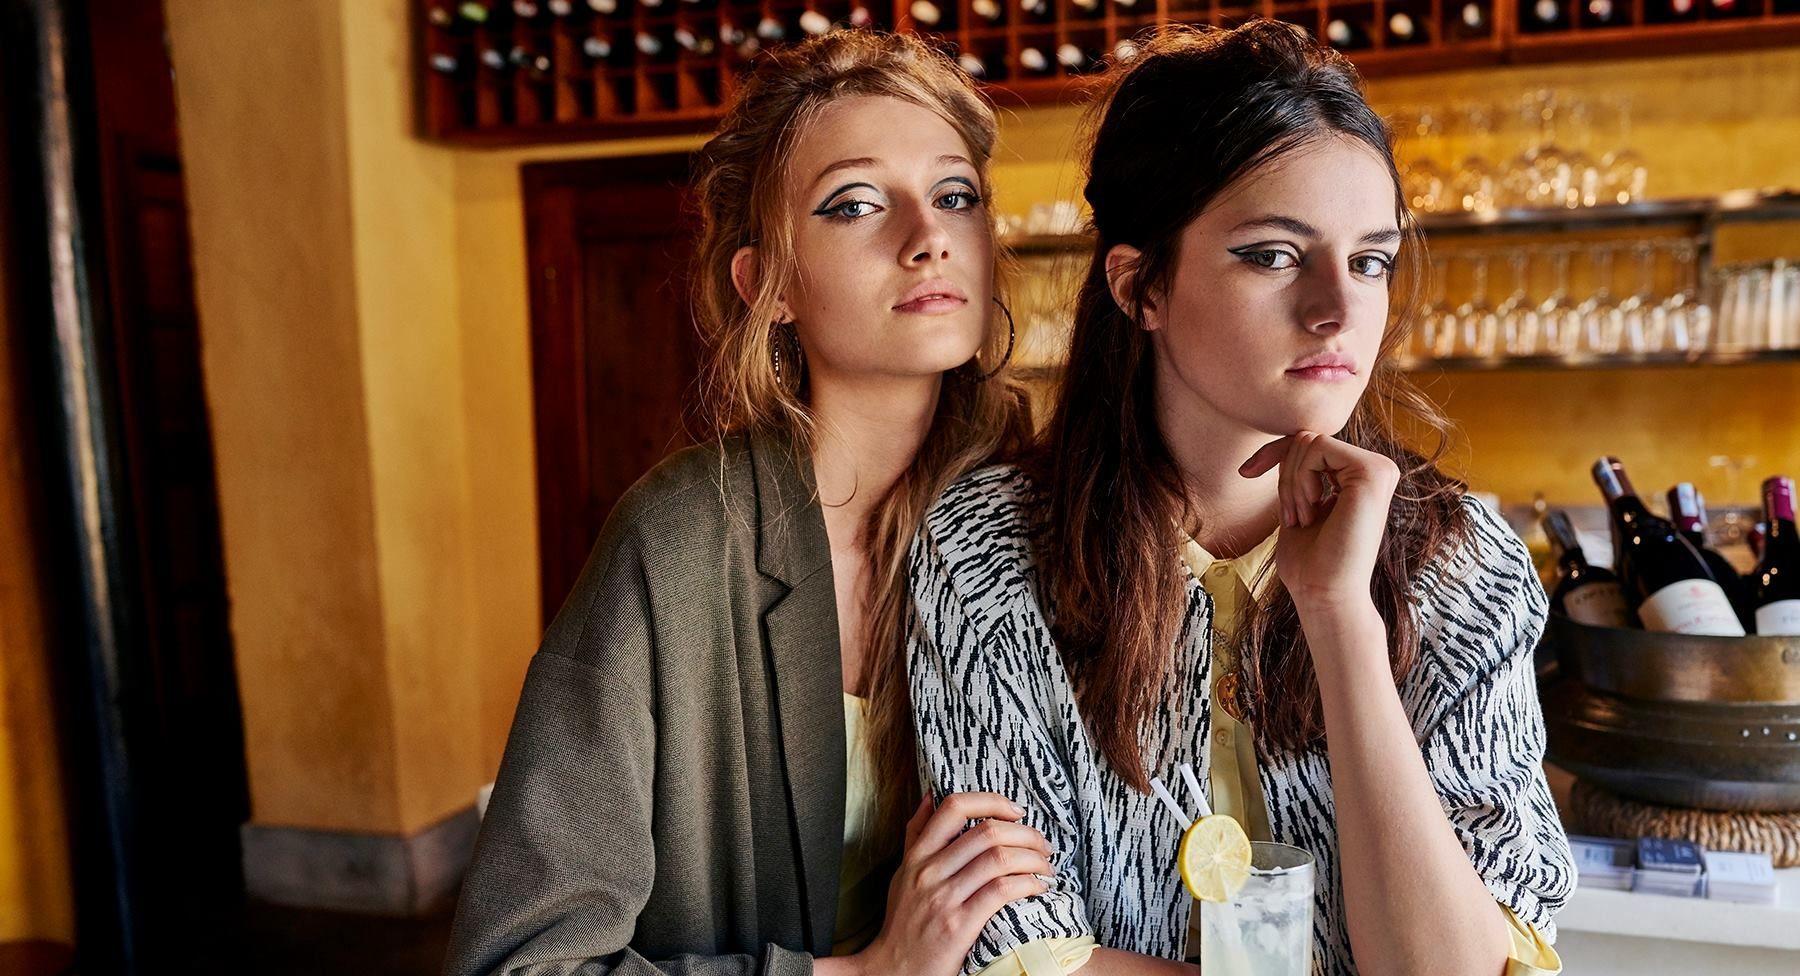 Sinsay promocje moda damska Kupon pl